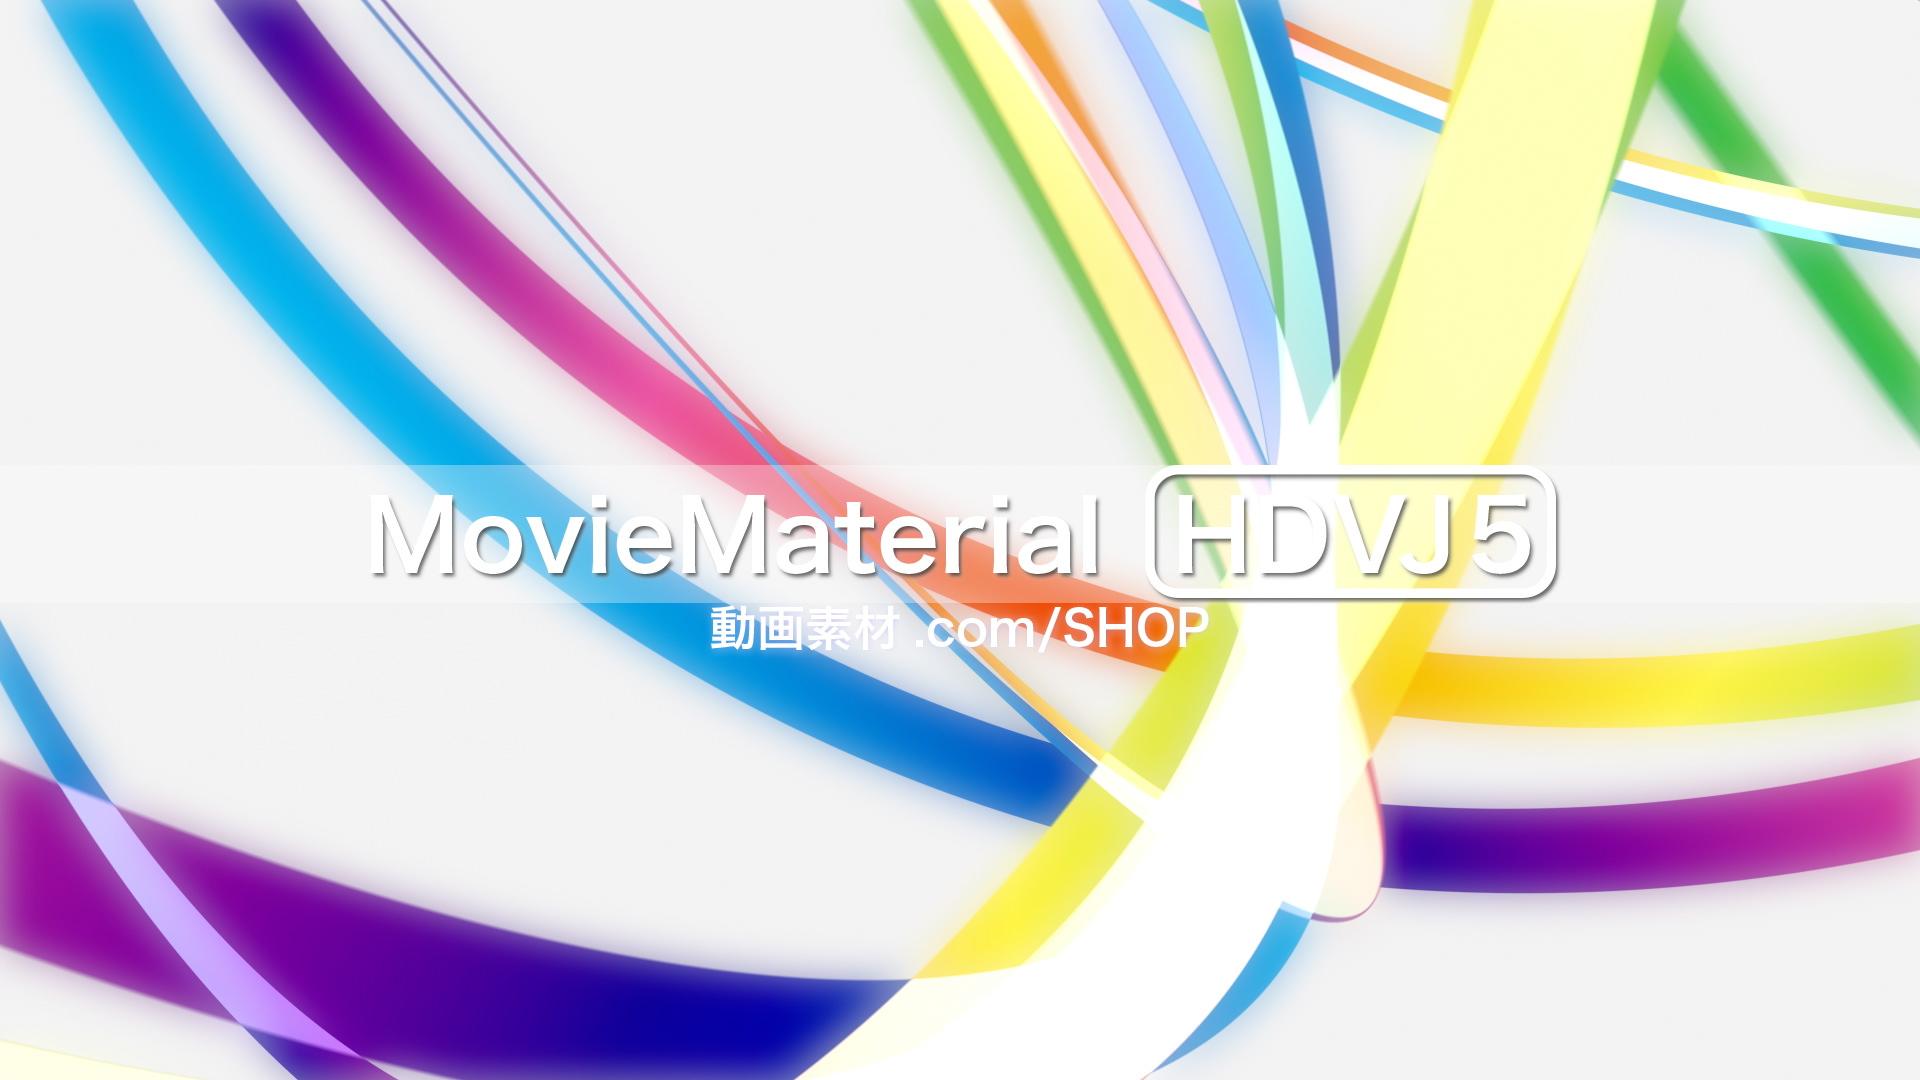 MovieMaterial HDVJ5 フルハイビジョンVJ動画素材集 画像3